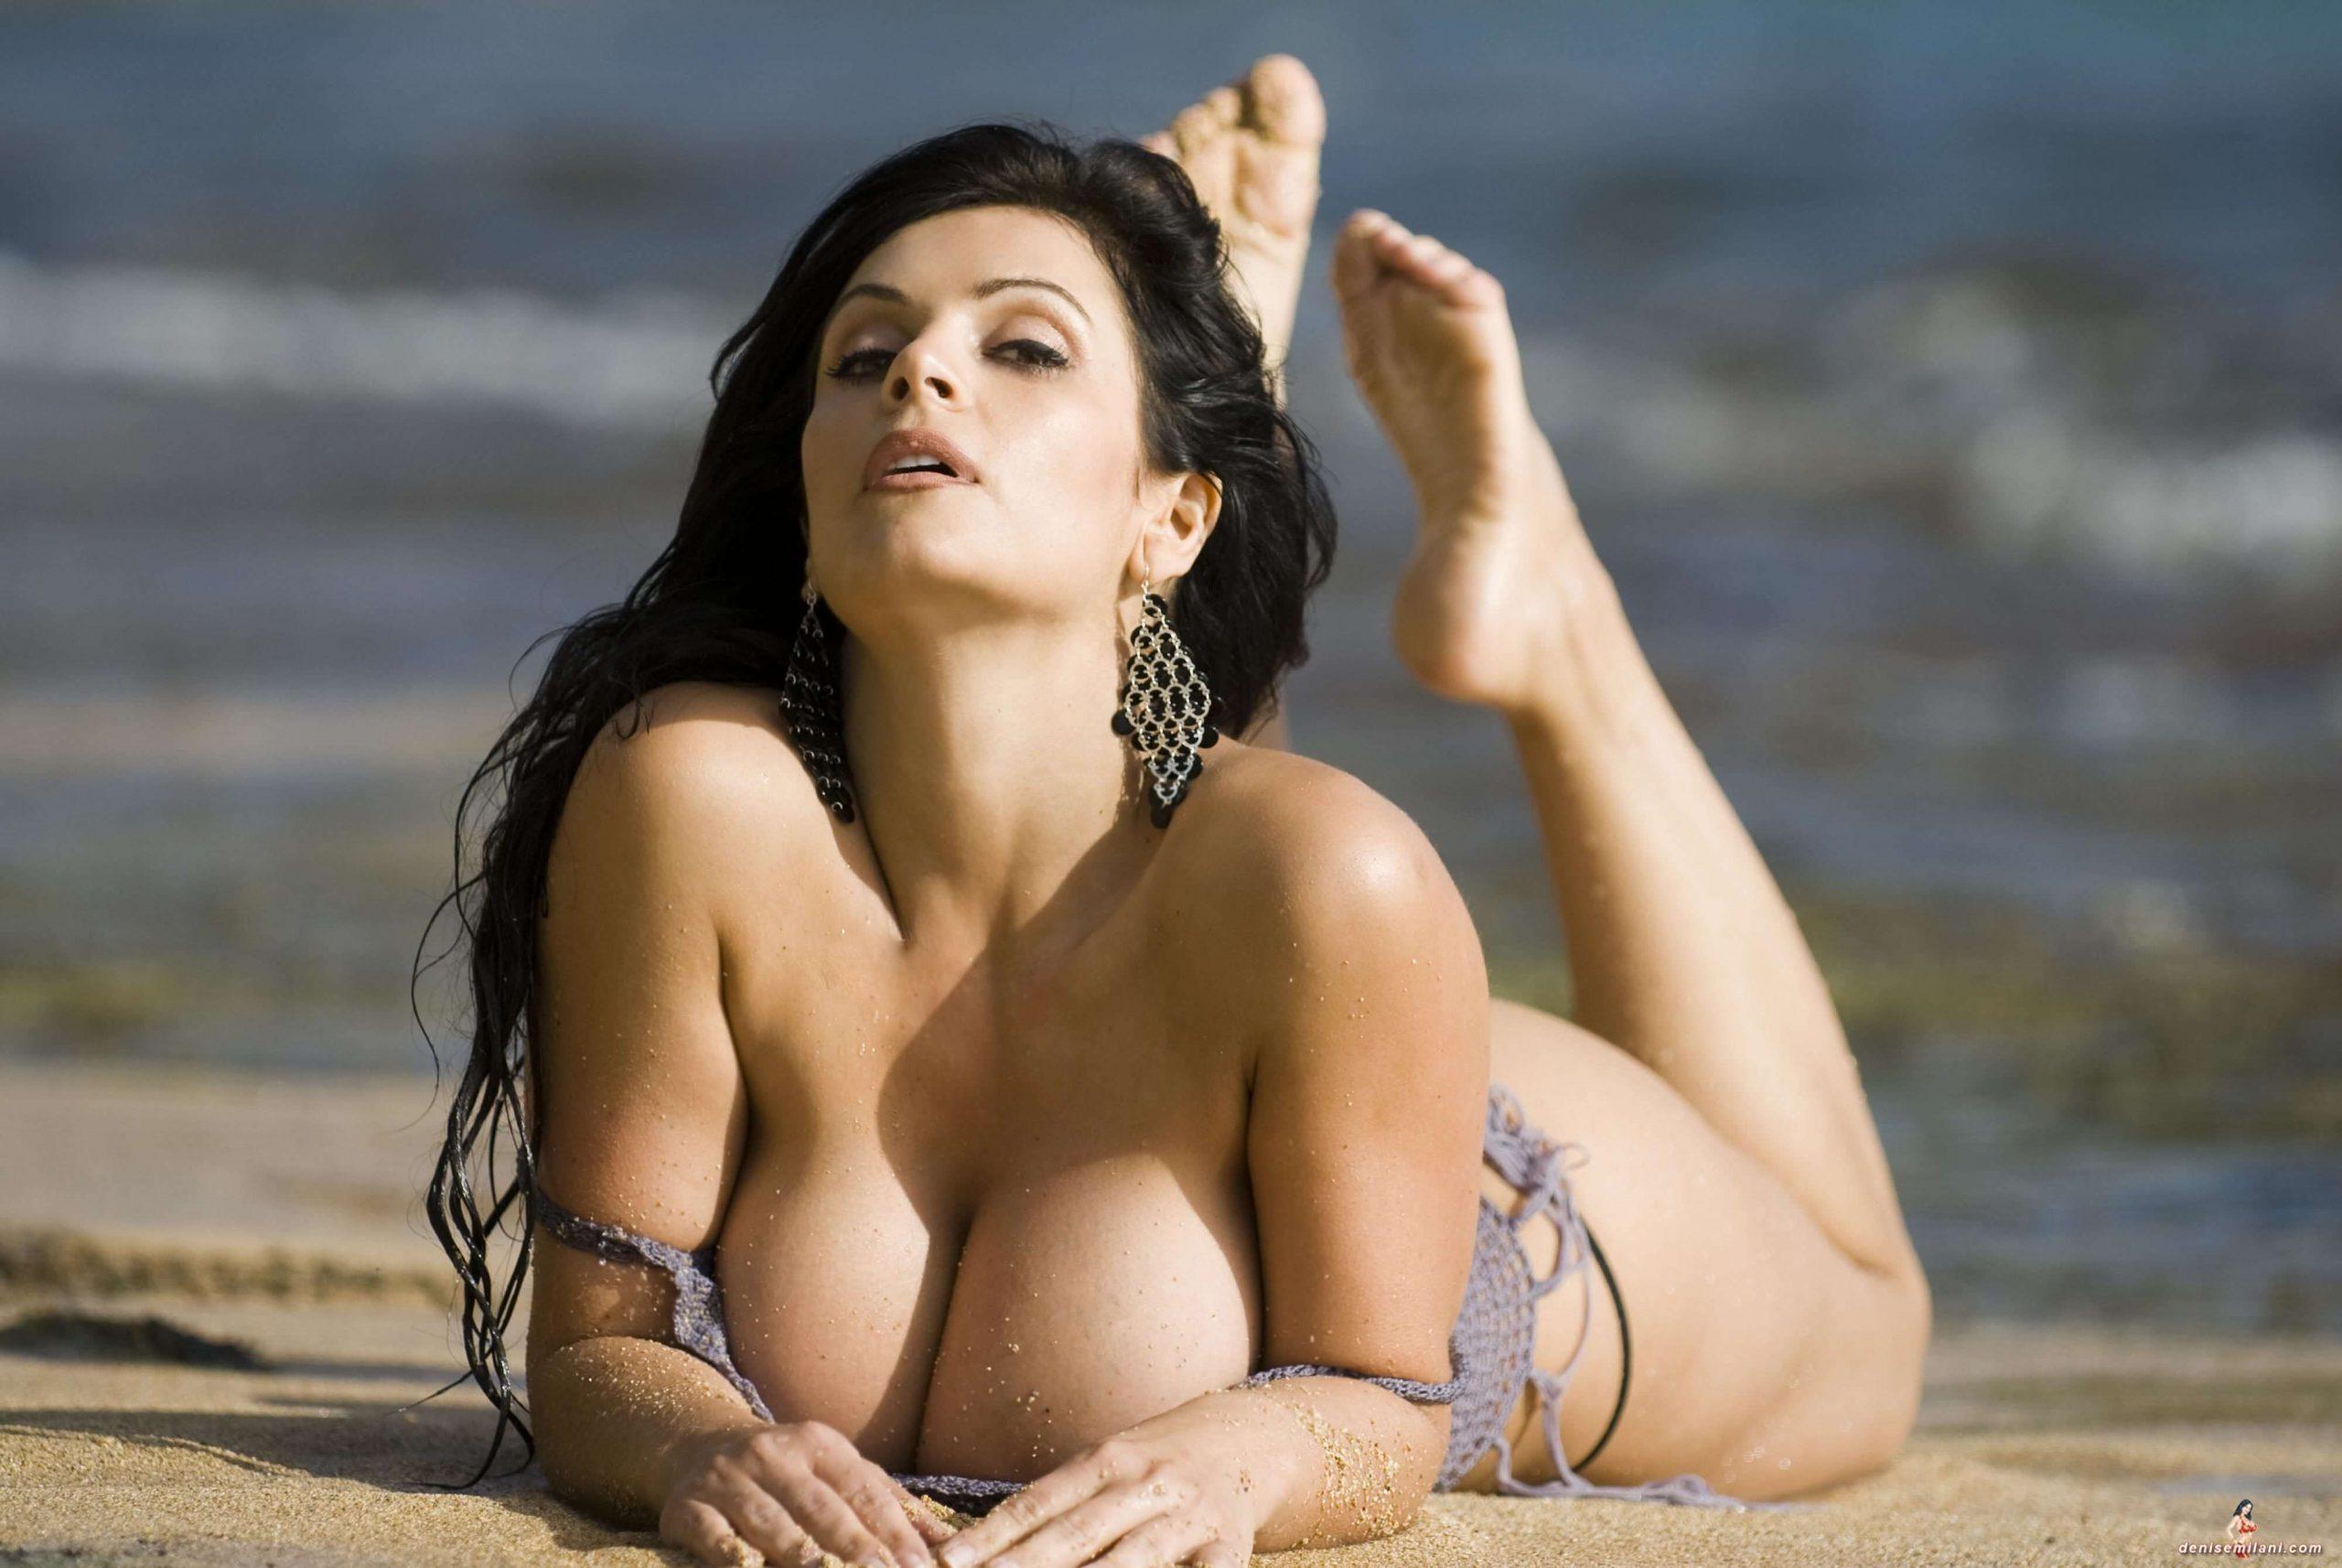 denise milani beach